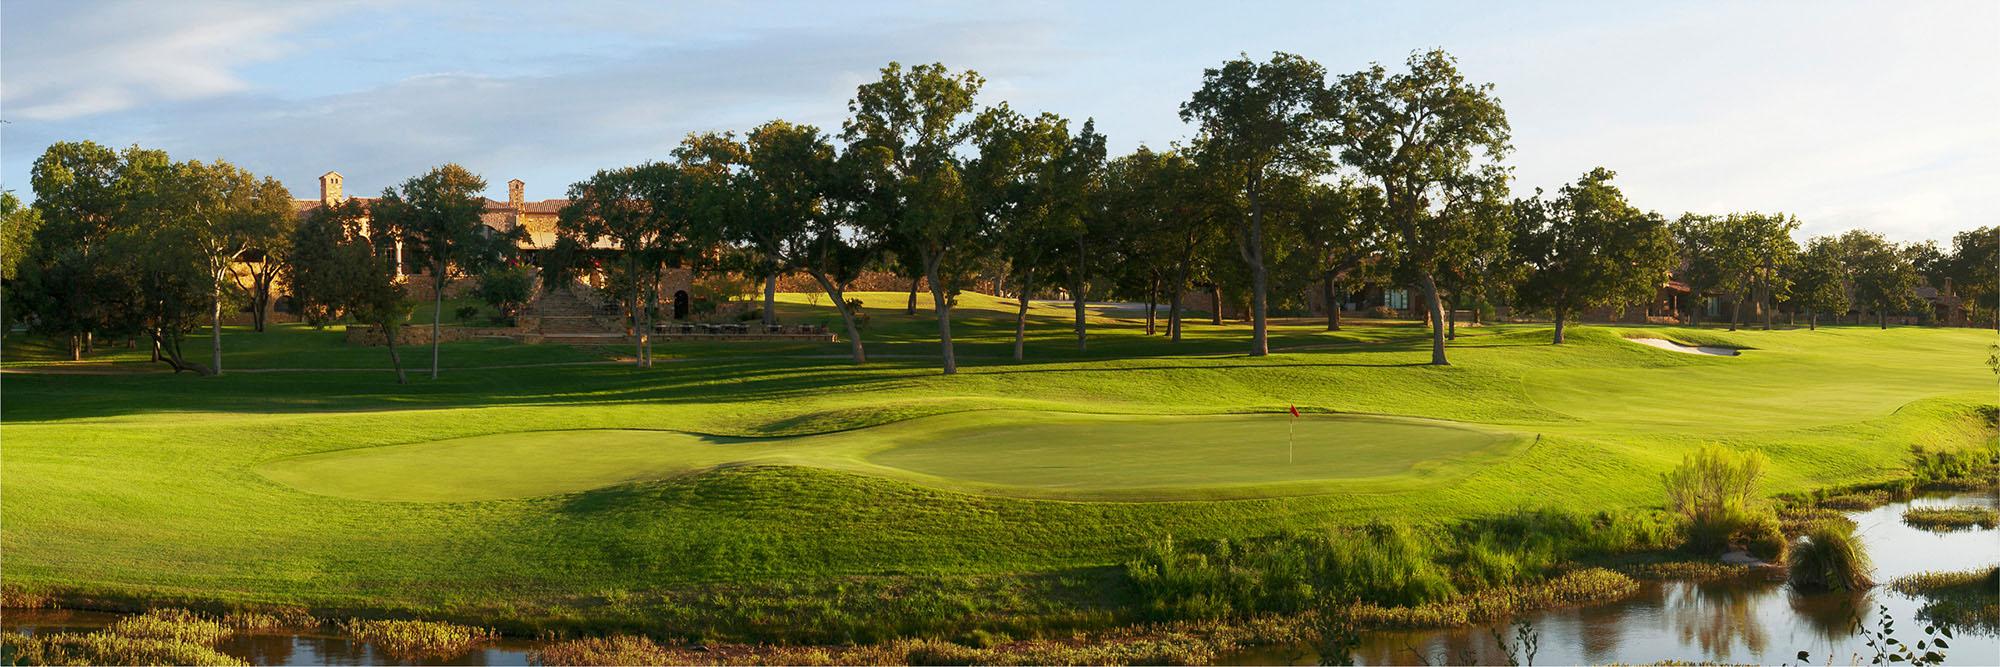 Golf Course Image - Escondido No. 18